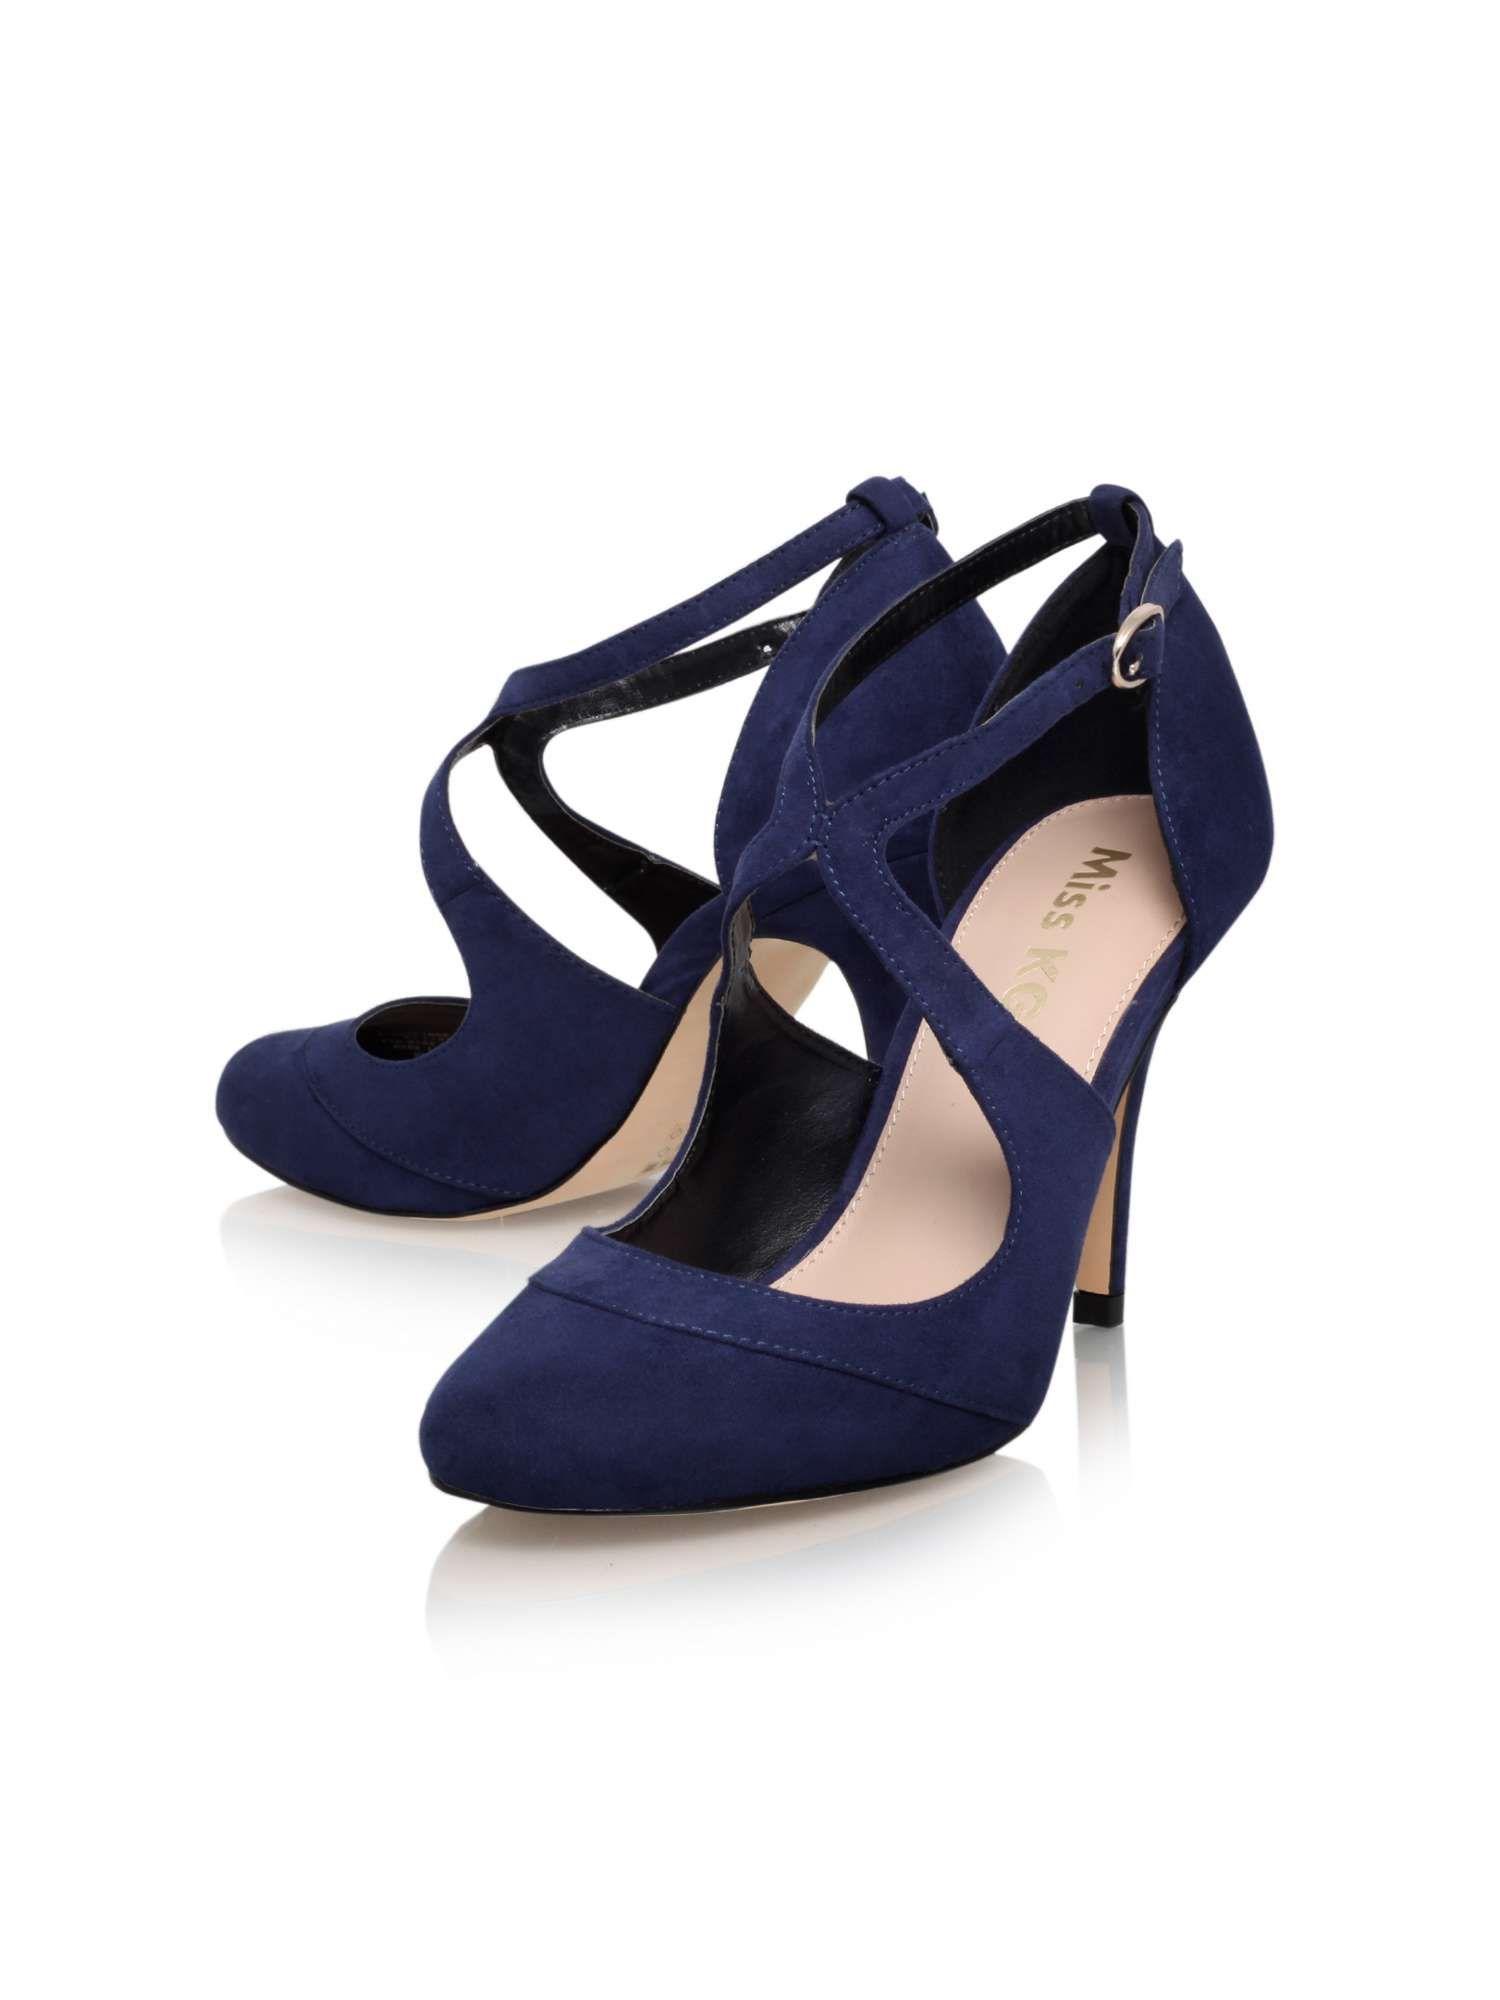 4740a7ecb5 Miss KG Natalie High Heeled Shoe - House of Fraser   Shoes in 2019 ...